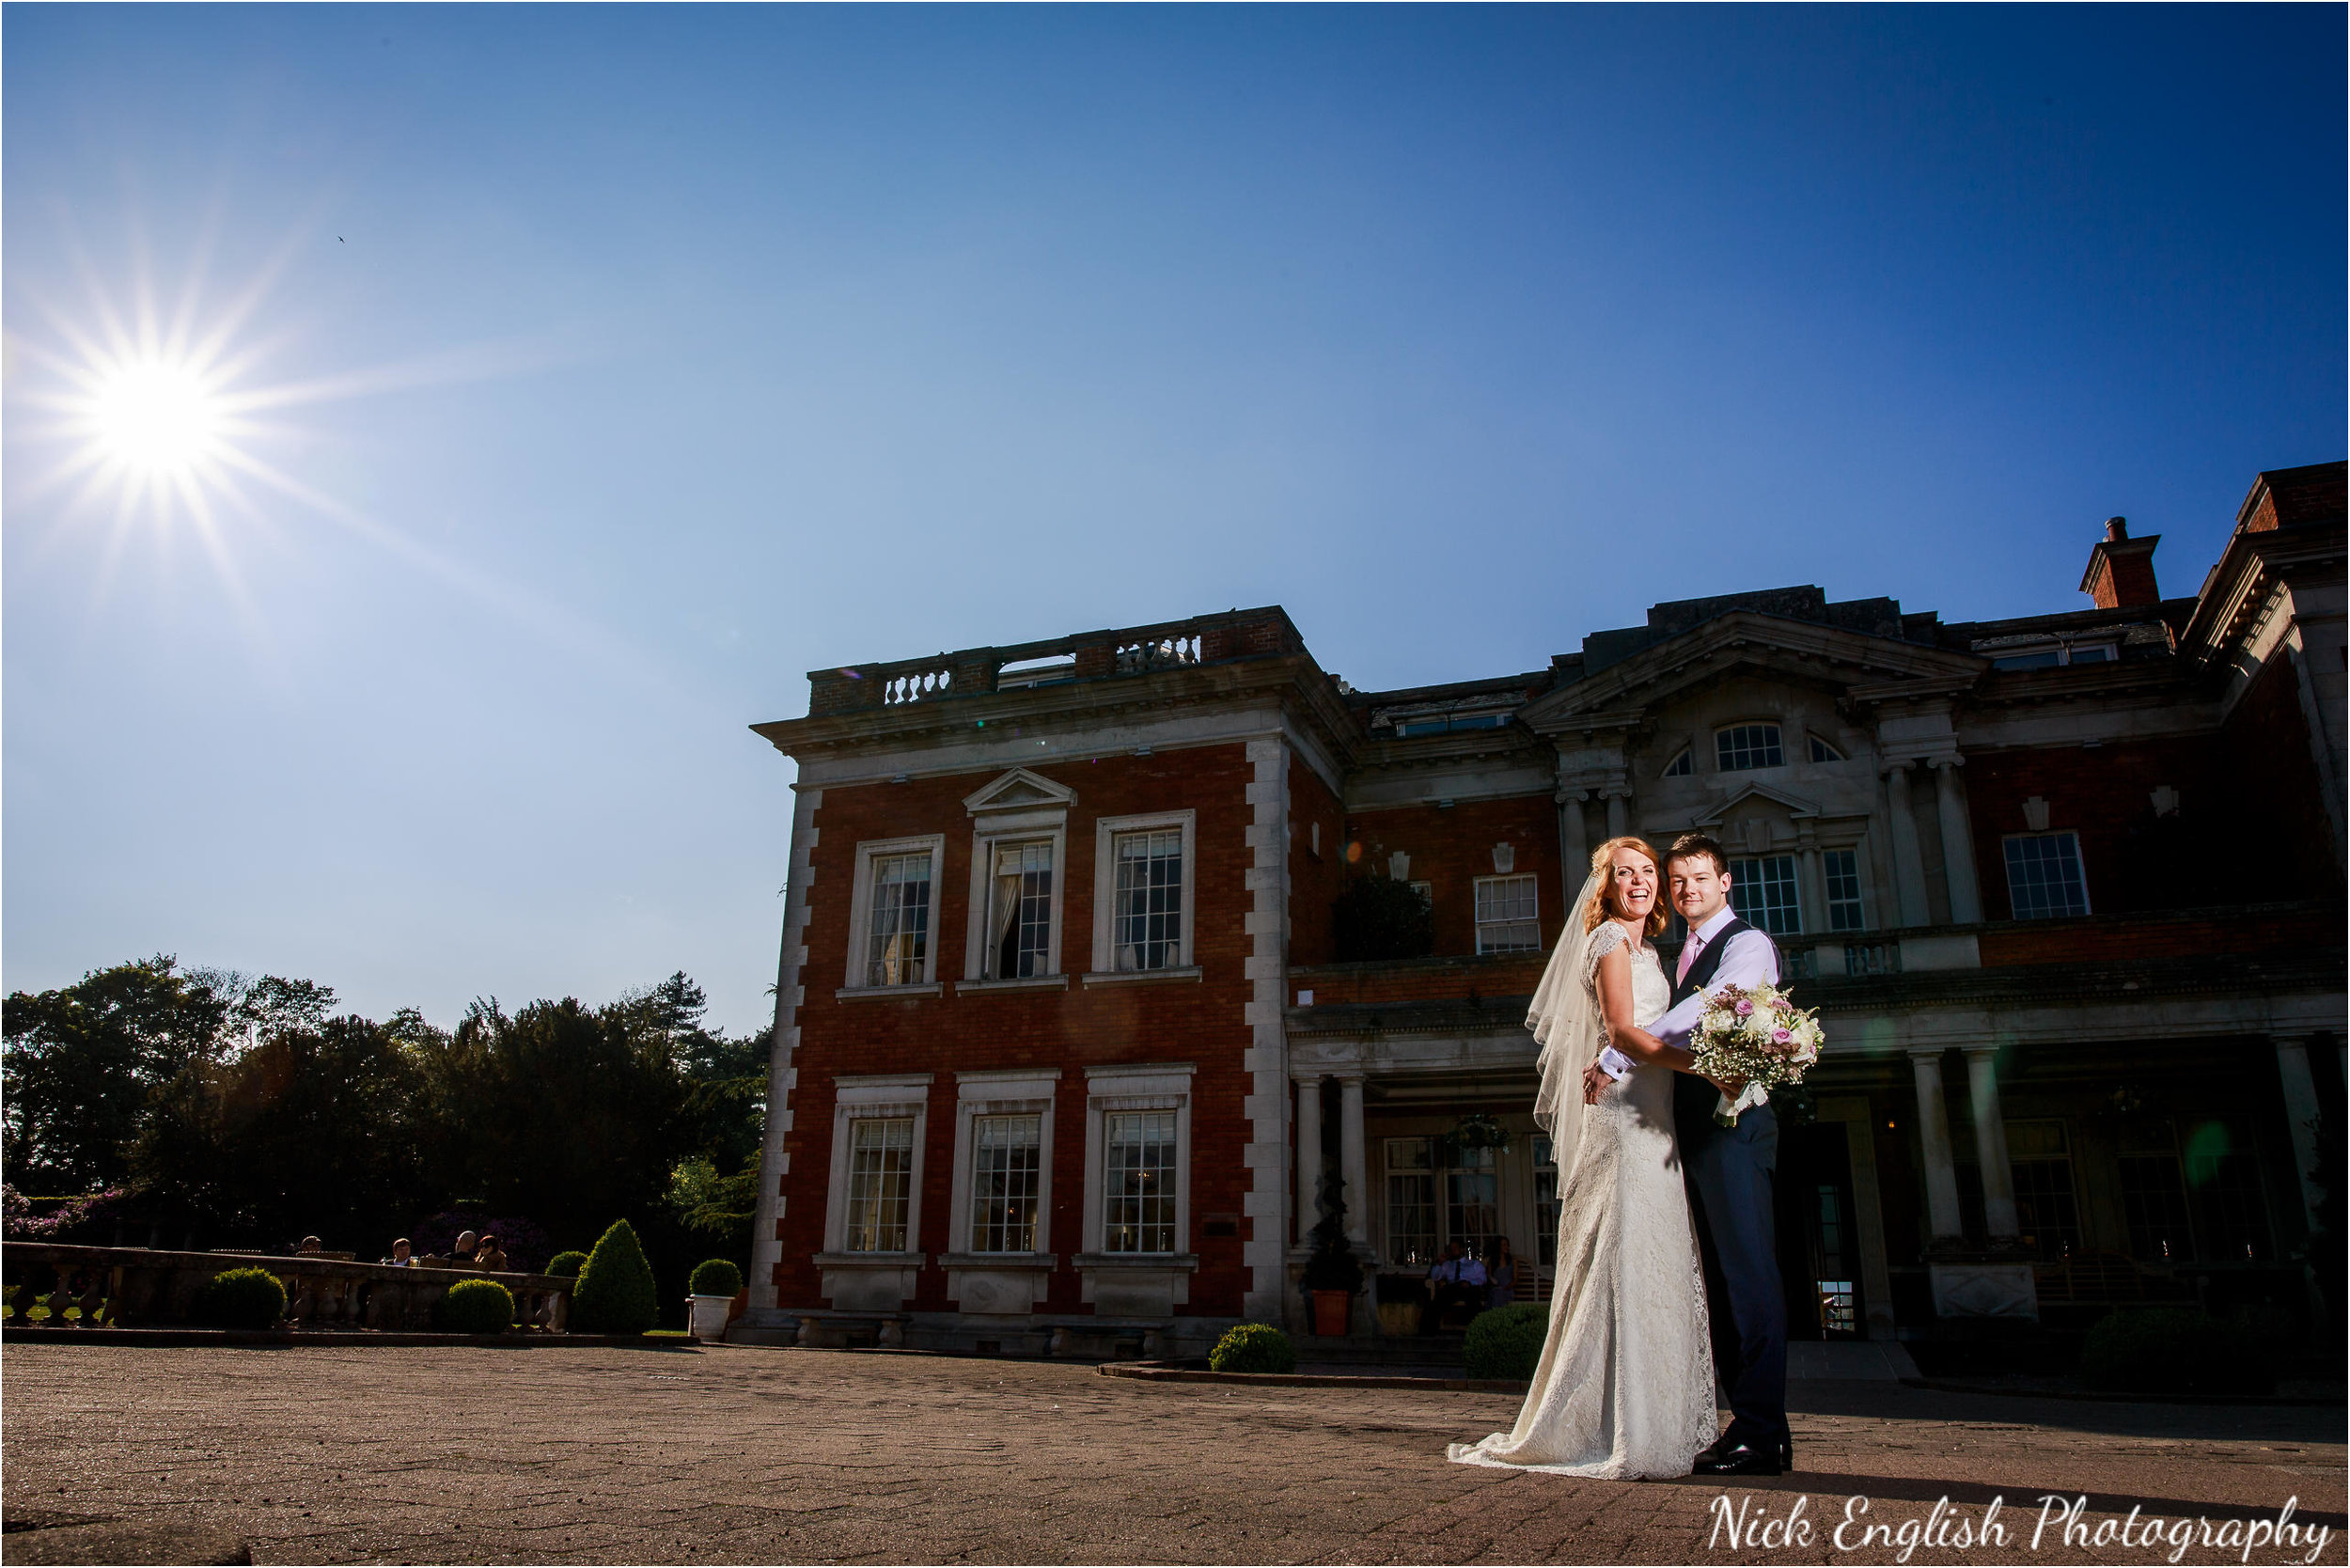 Alison James Wedding Photographs at Eaves Hall West Bradford 190jpg.jpeg